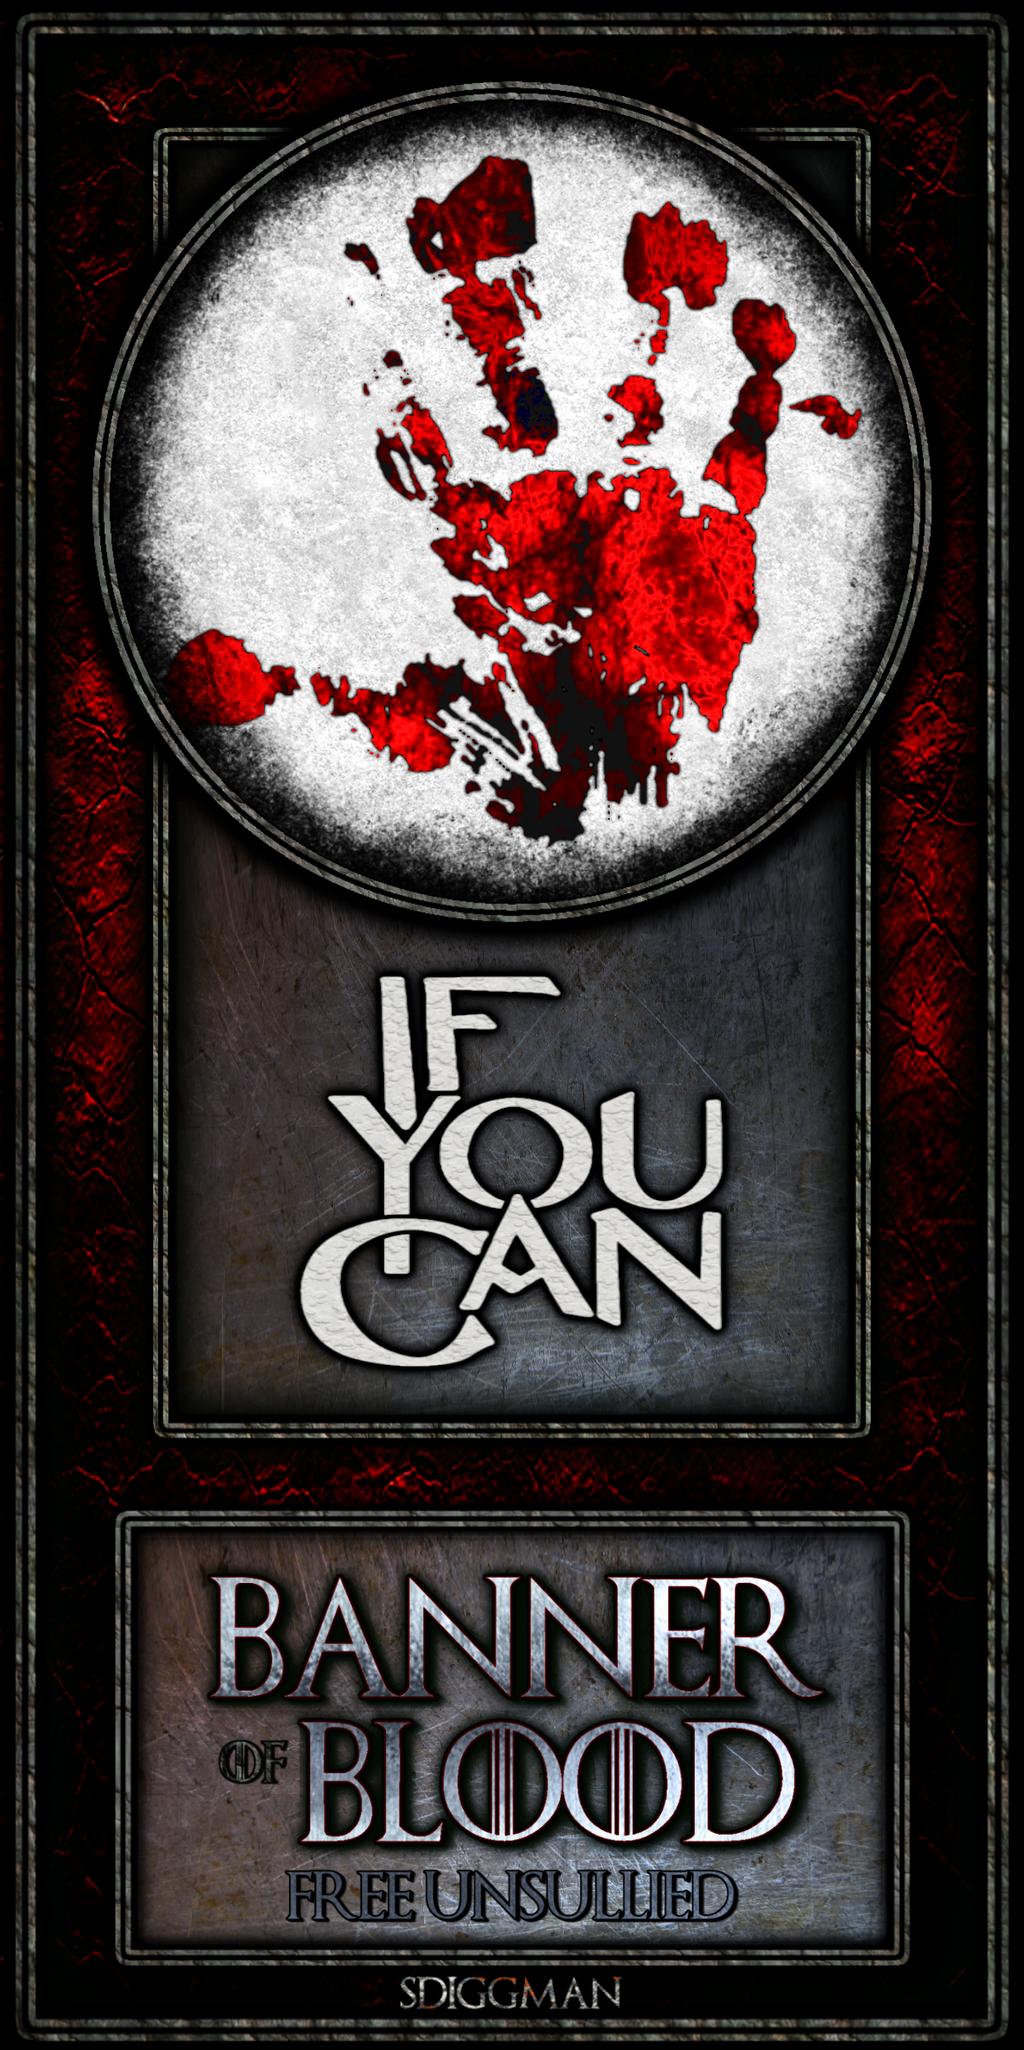 Bloodbannerifyoucan (1) by sdiggman